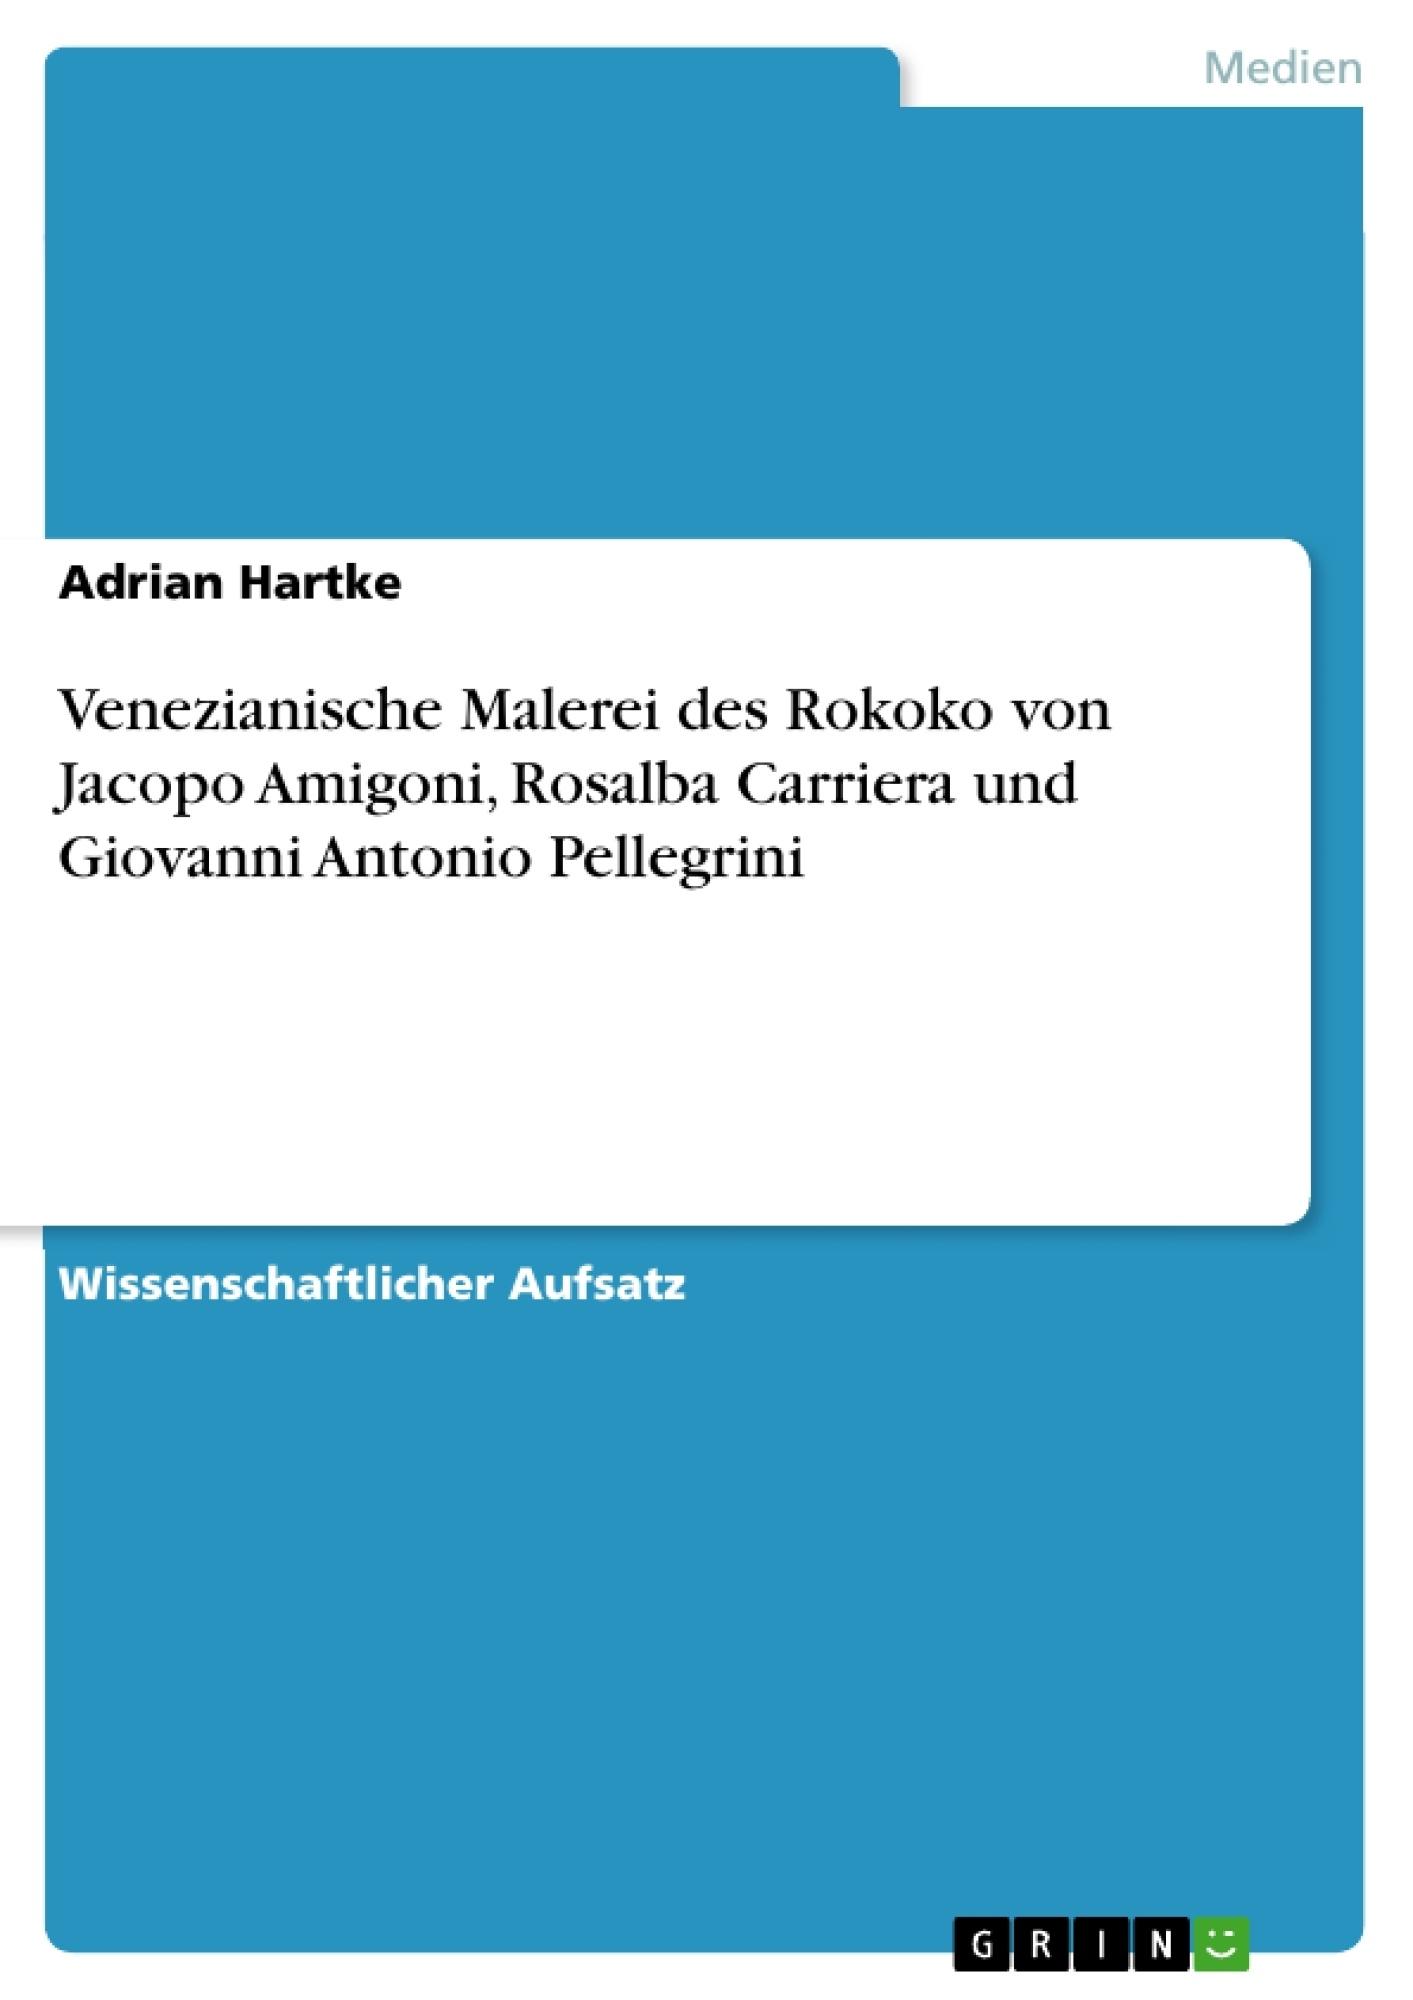 Titel: Venezianische Malerei des Rokoko von Jacopo Amigoni, Rosalba Carriera und Giovanni Antonio Pellegrini